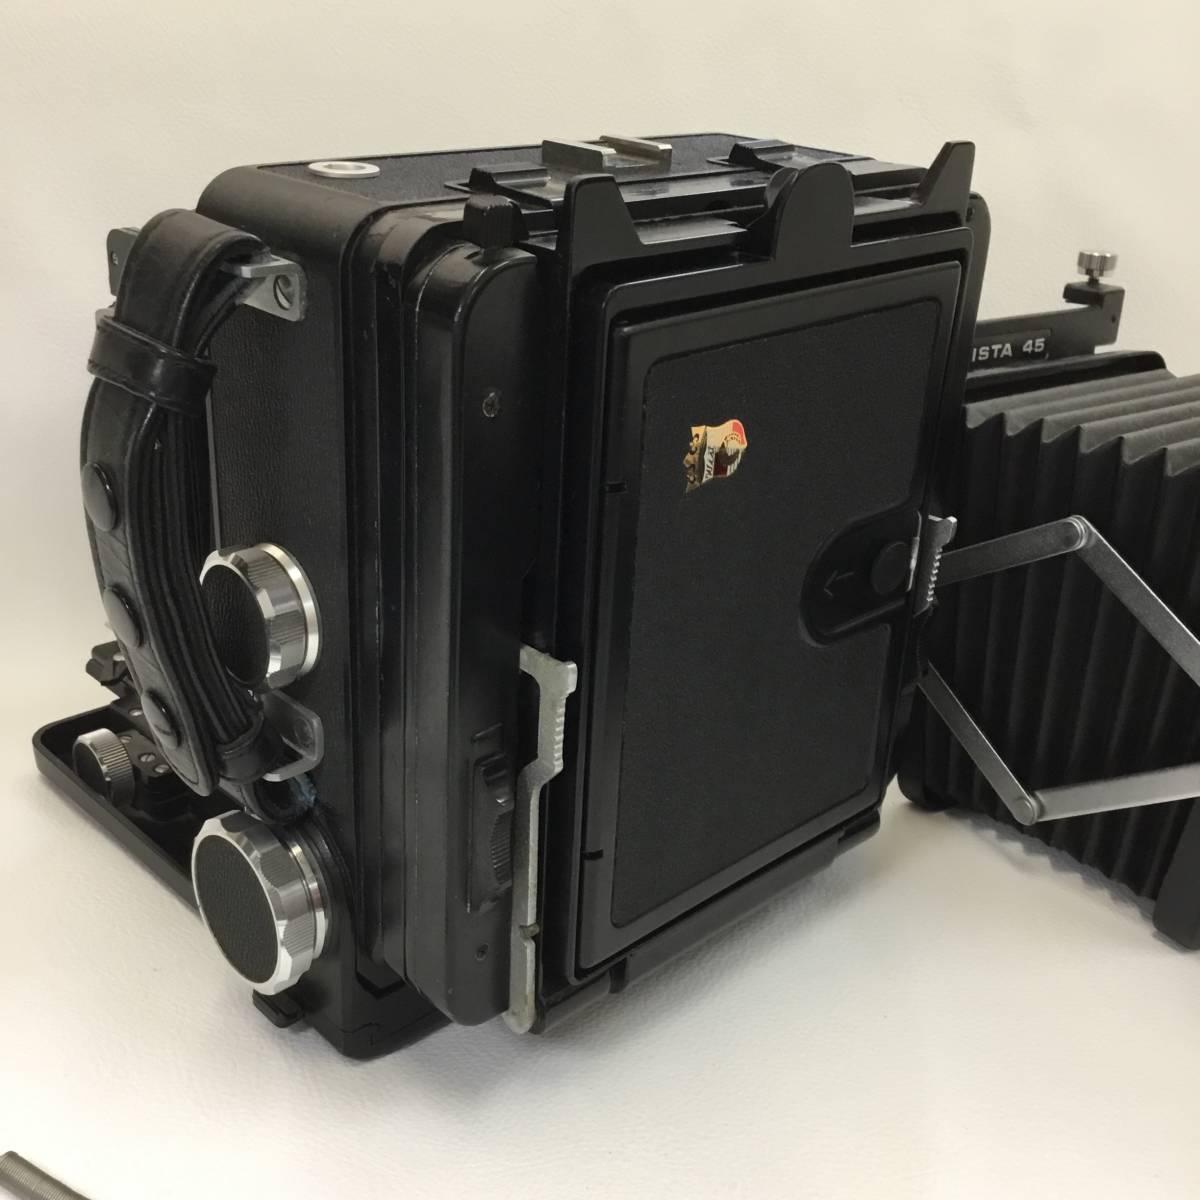 WISTA 45 ウィスタ45 レンズ 付属品セット 大判カメラ_画像4